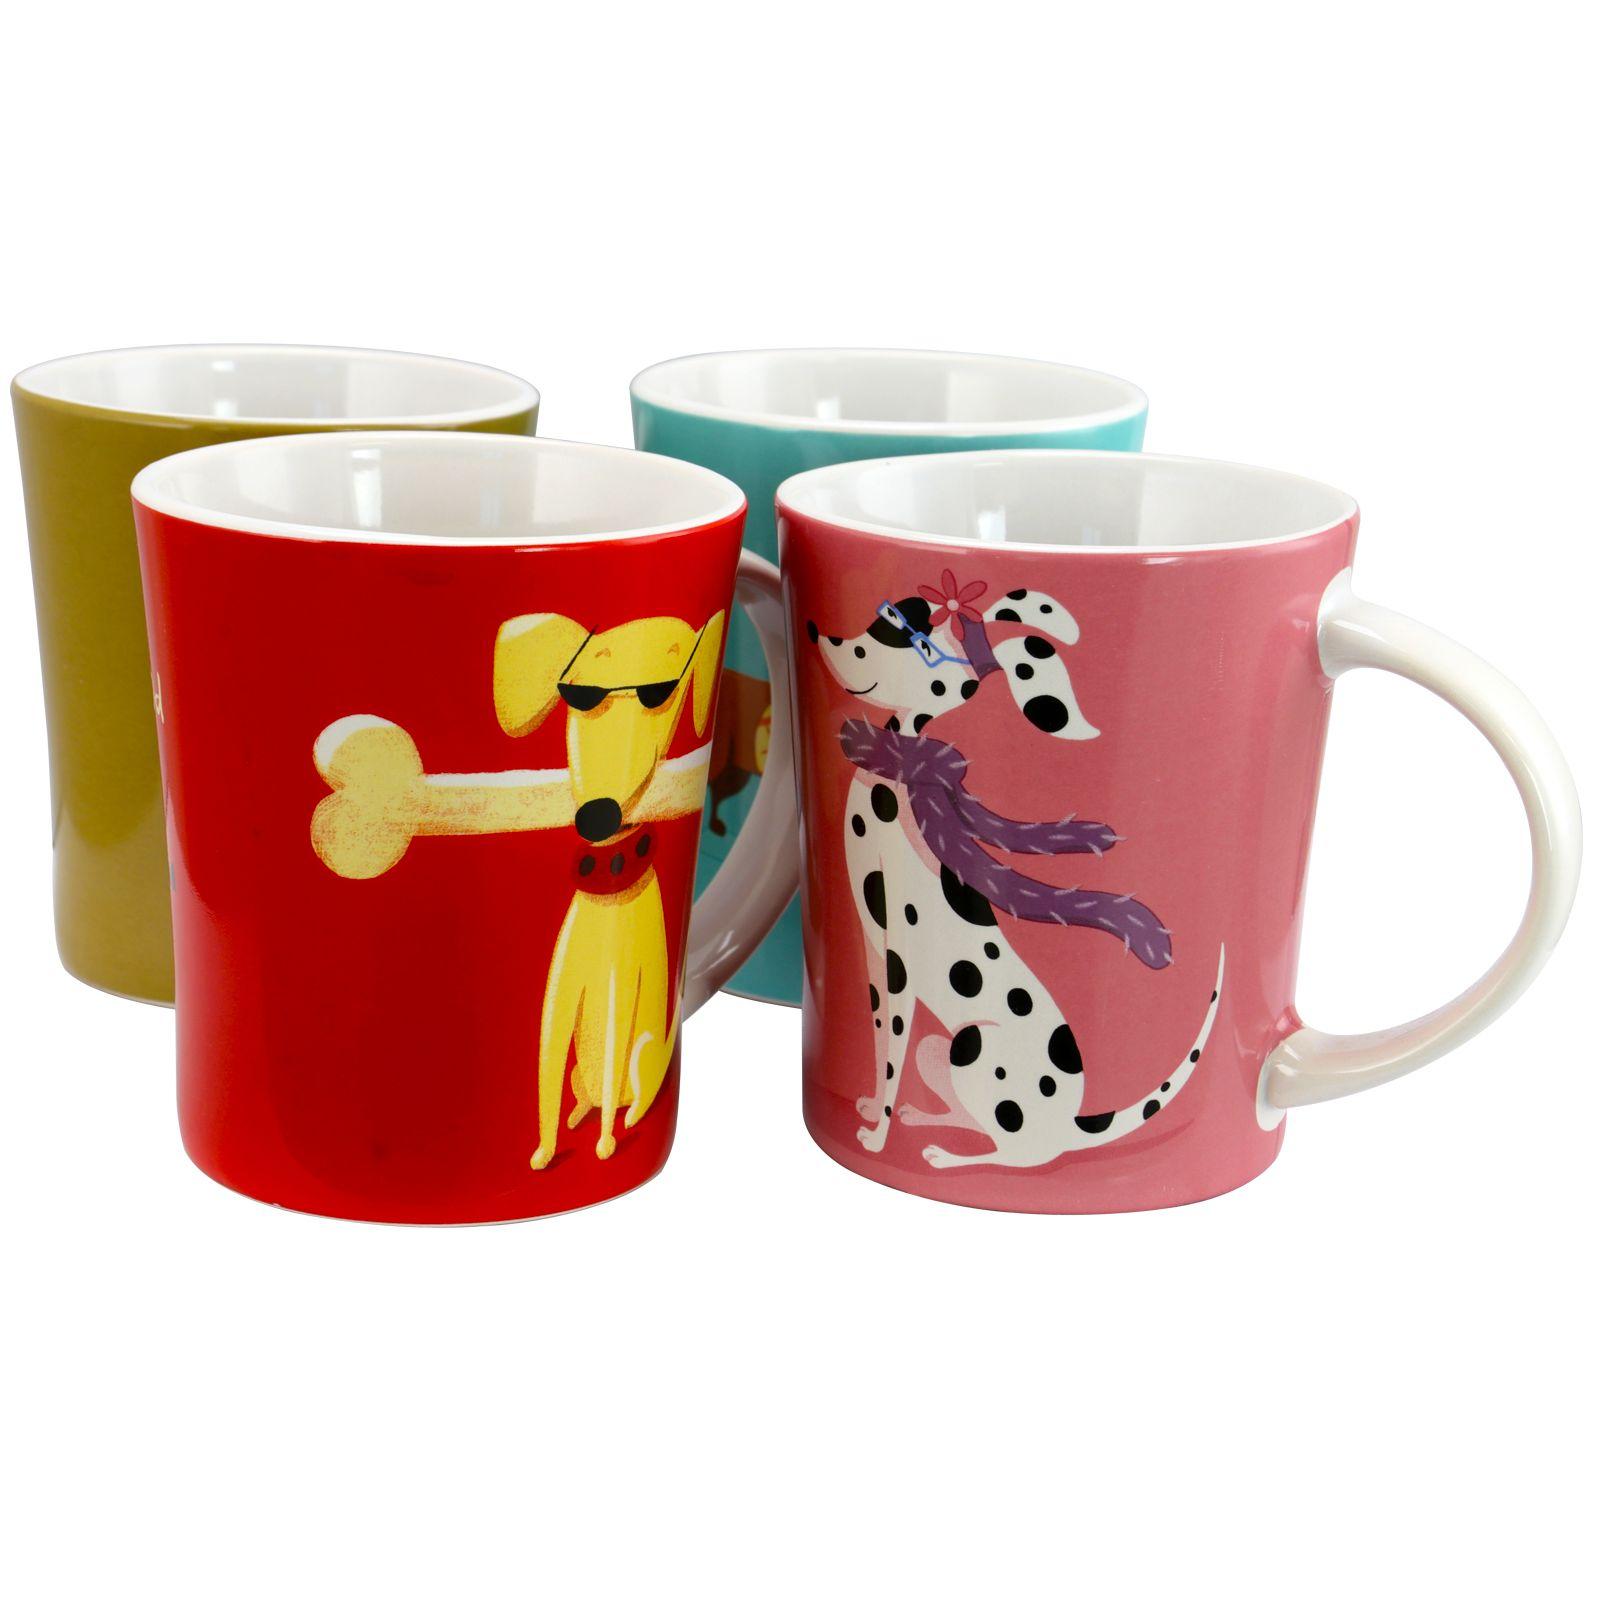 6d15e1cdfaf Gibson Home Doggy Daily 15 oz Mug Set, Set of 4 Assorted Designs in ...